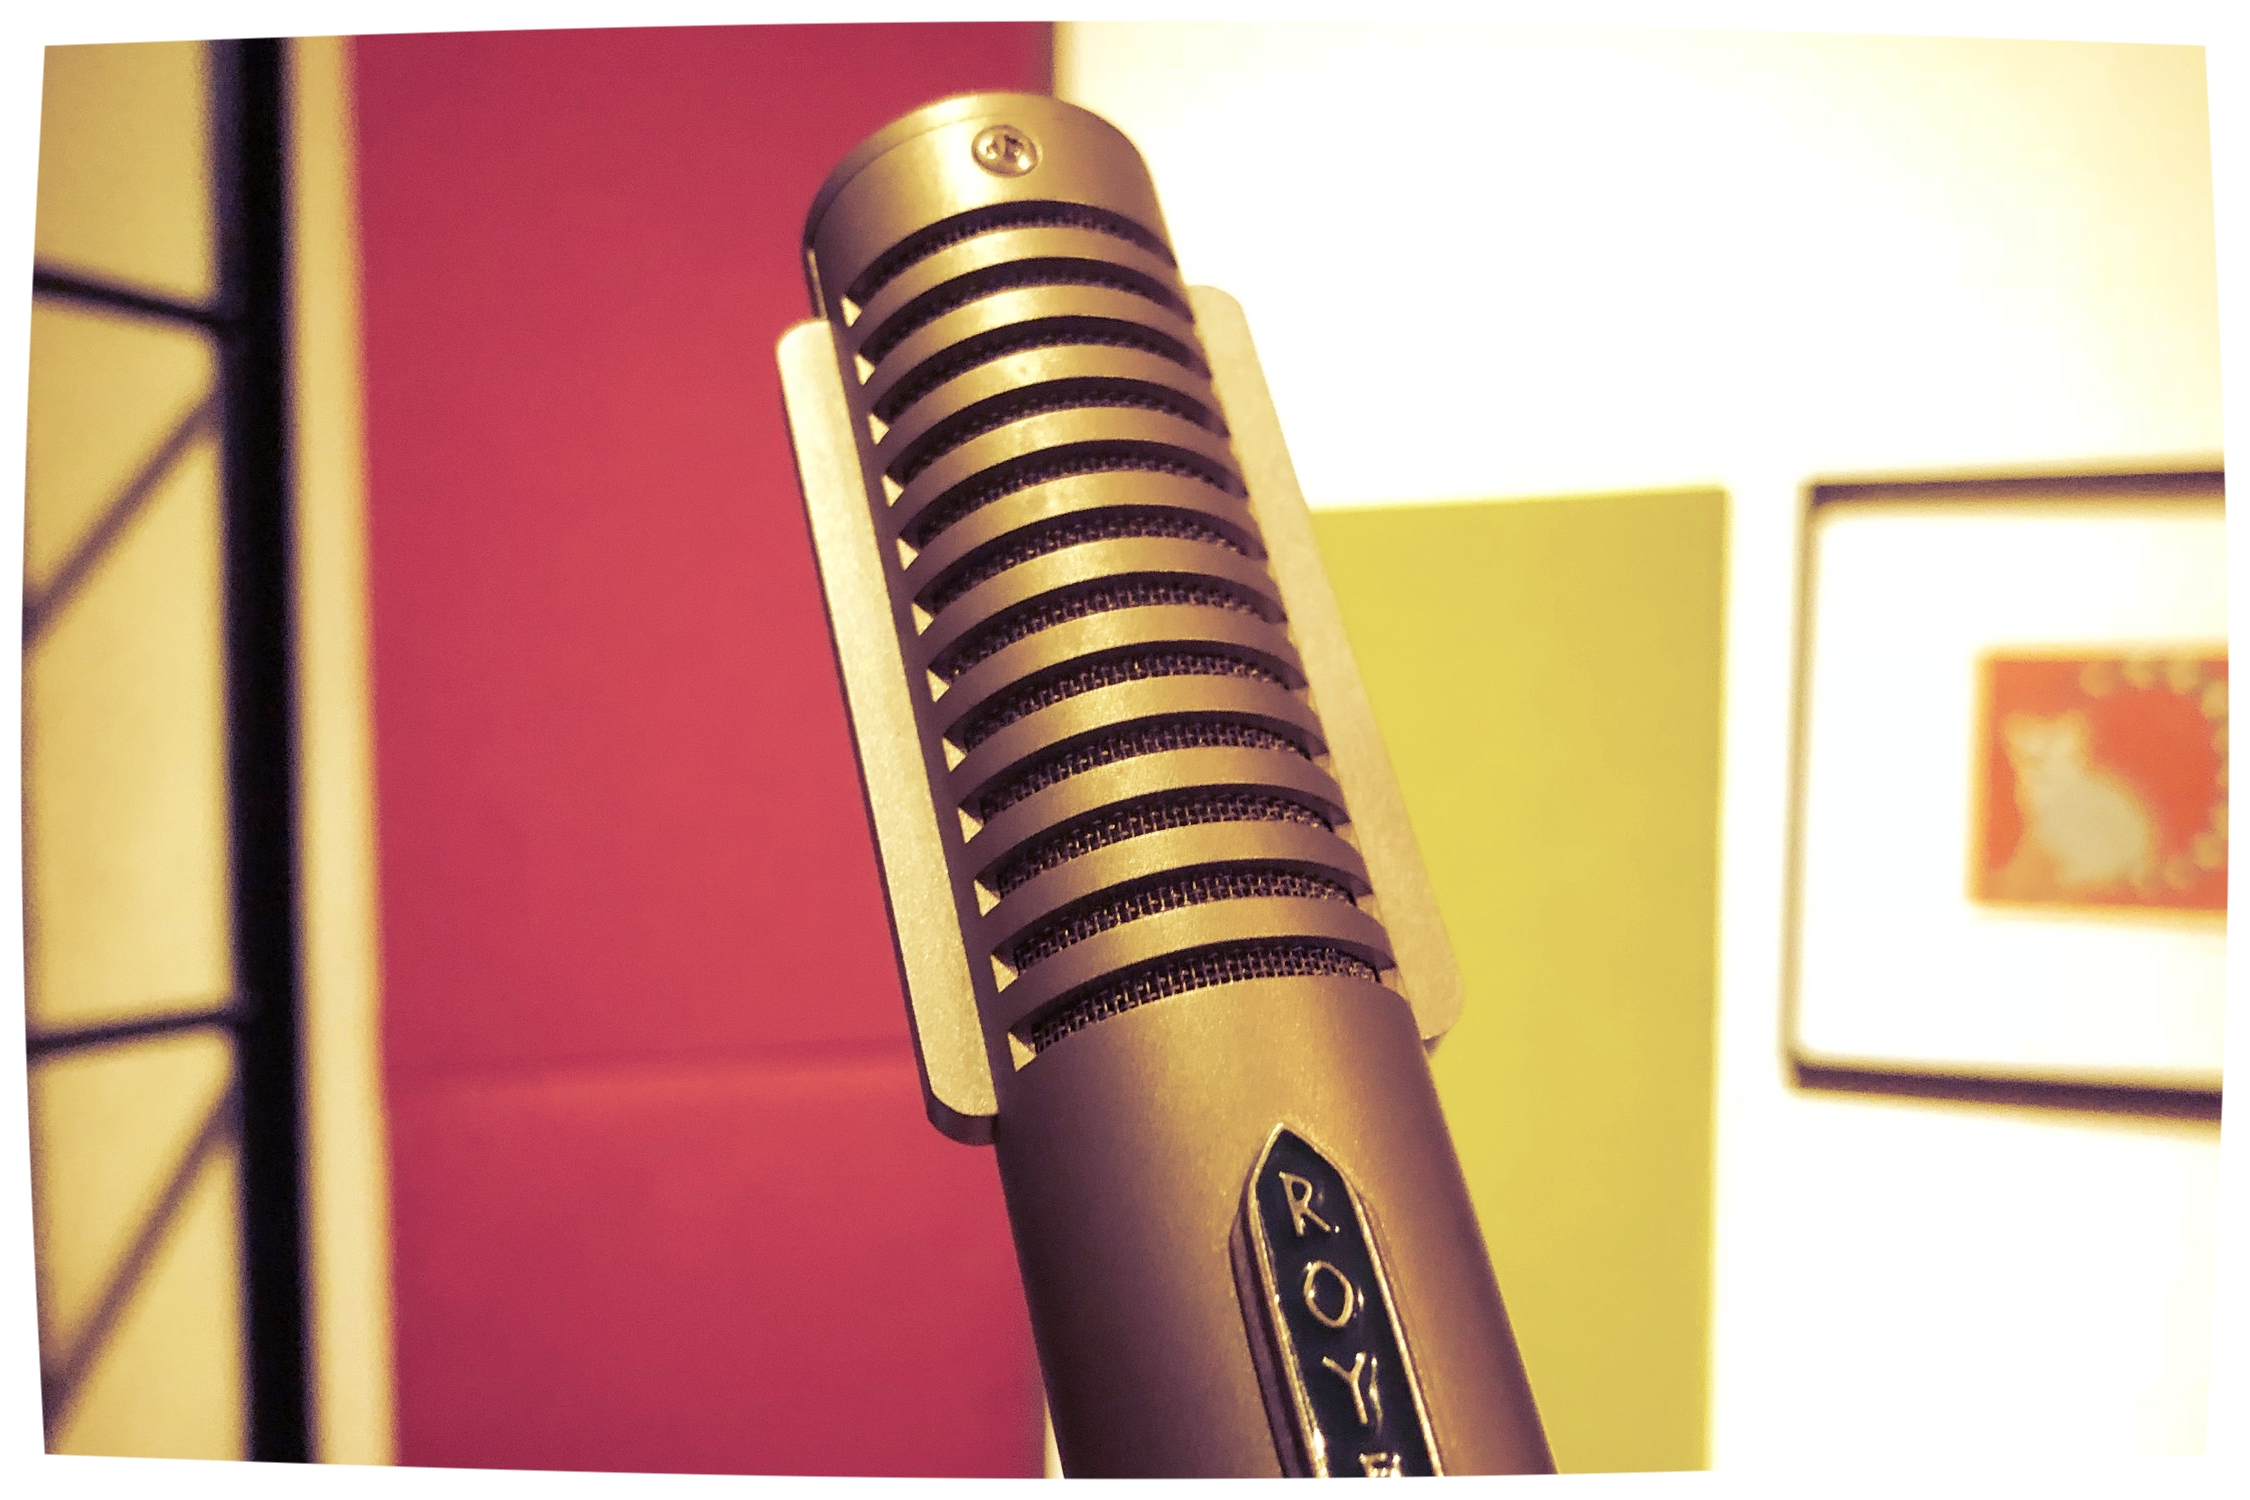 Recording - Royer R-121Mojave MA-200Neumann KM184 Stereo PairAKG C414Shure SM81 & tons of 57sNeve 1073dpa PreampA-Designs REDDINagra IV-STC